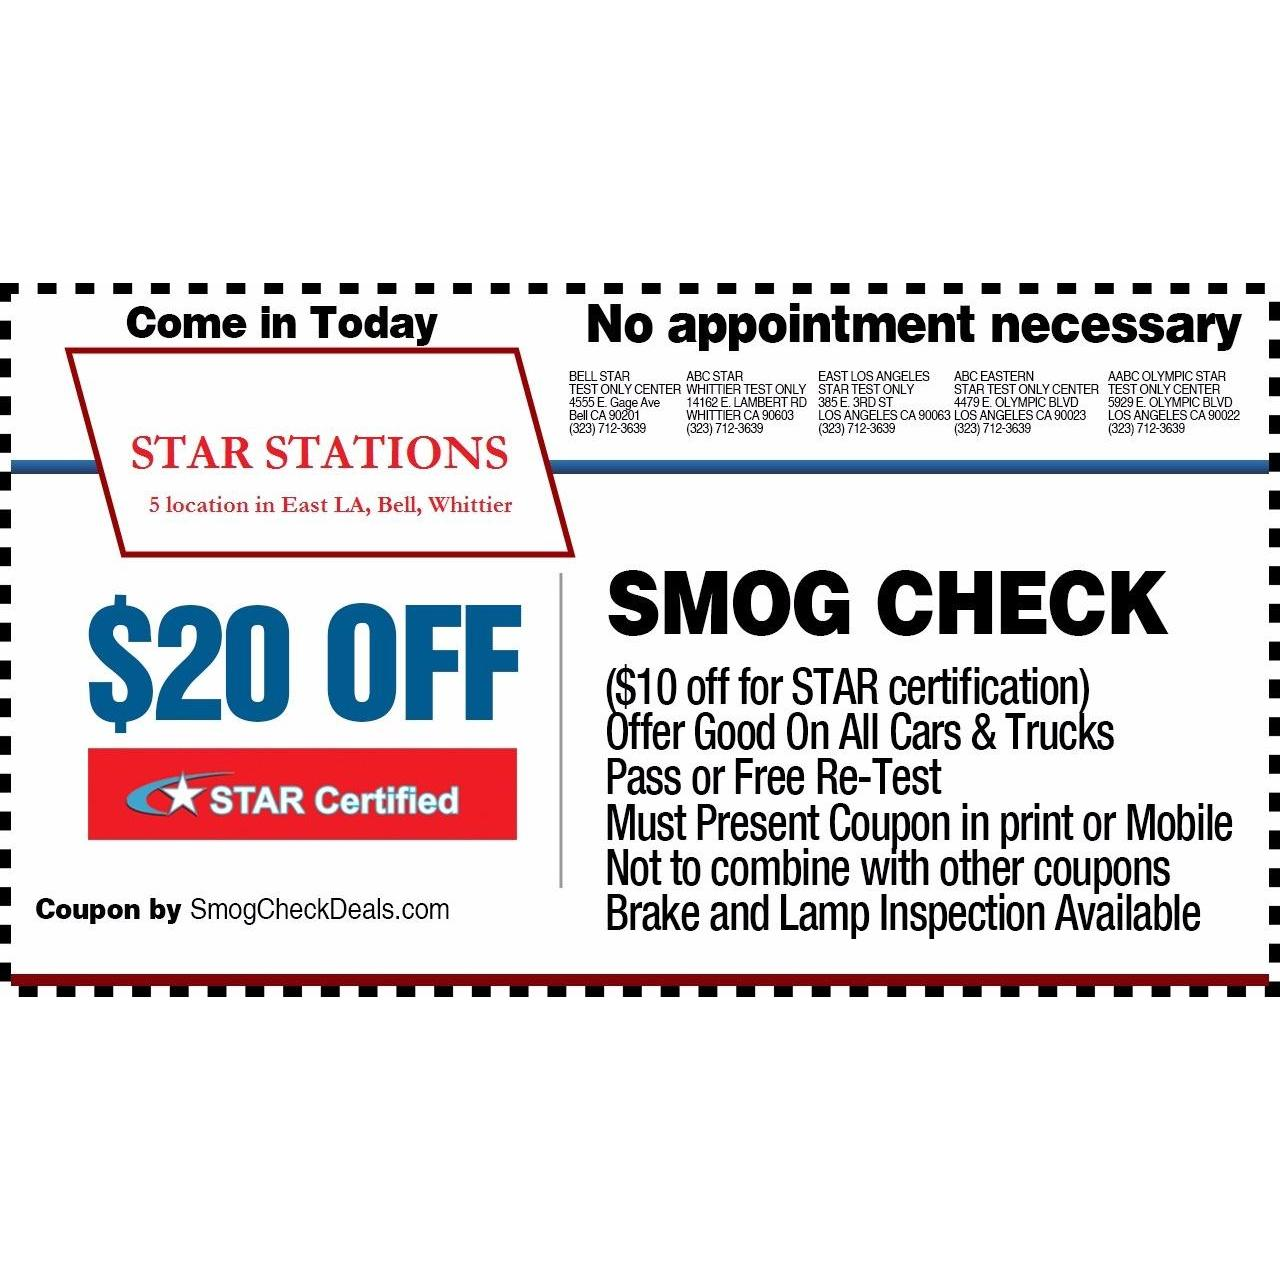 ABC Smog Check